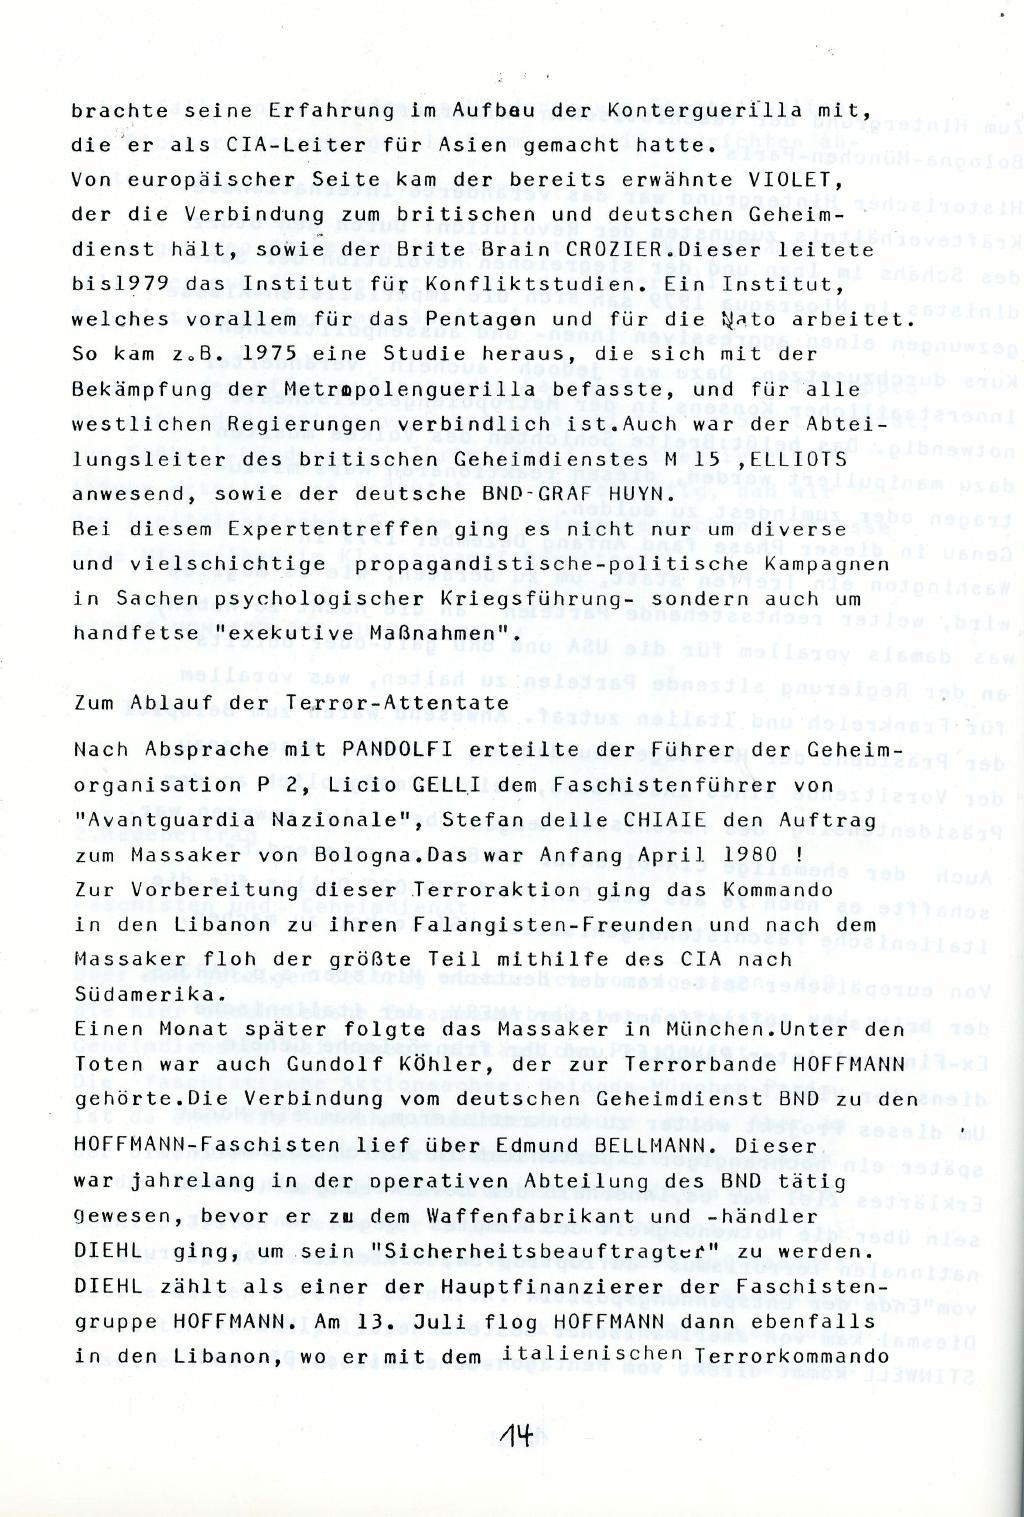 Berlin_1983_Autonome_Gruppen_Faschismus_im_Kapitalismus_14